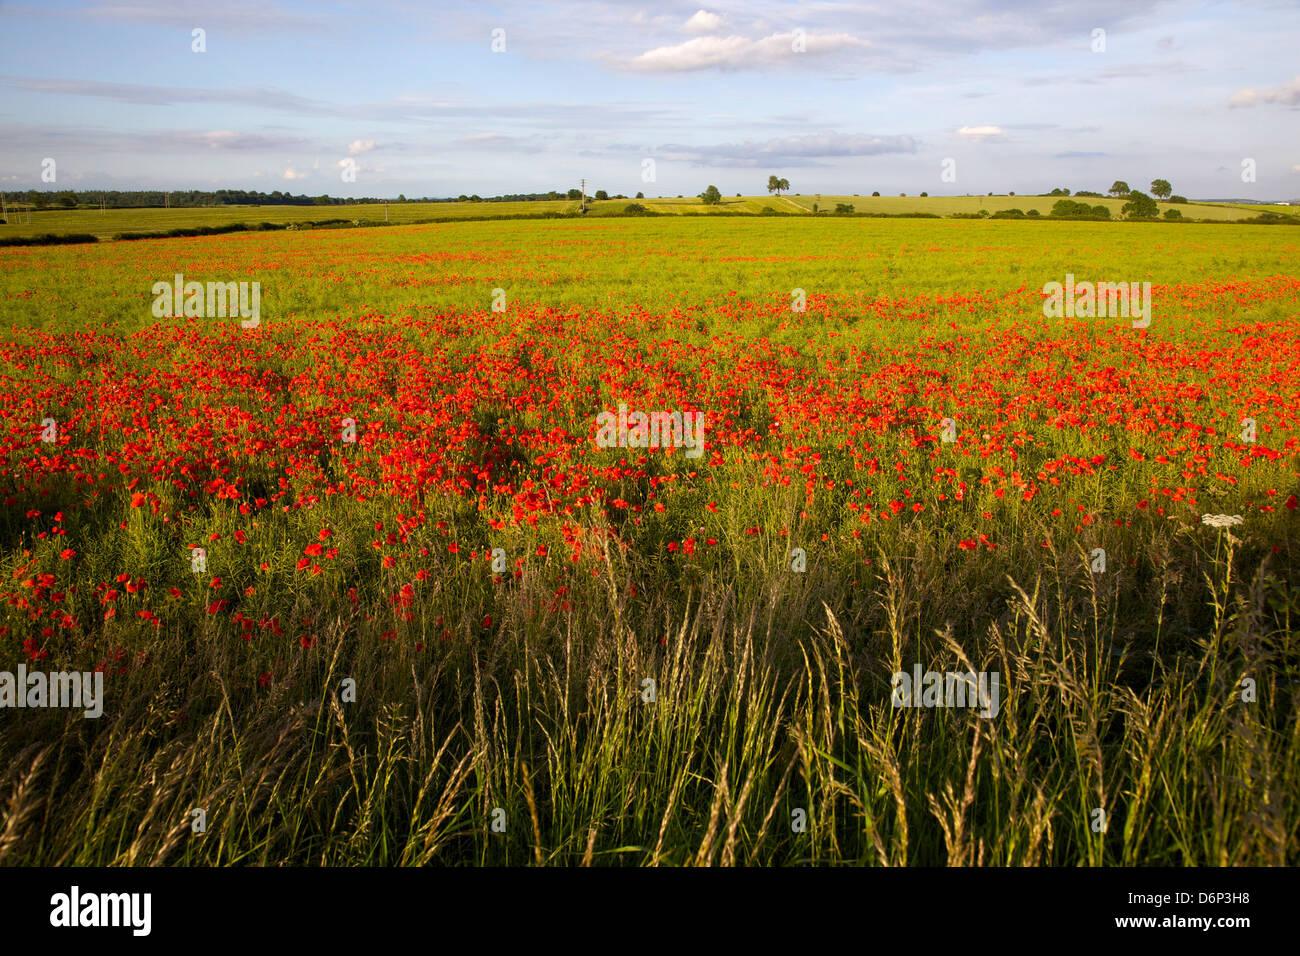 Poppy field near Scarcliff Village, Derbyshire, England, United Kingdom, Europe - Stock Image